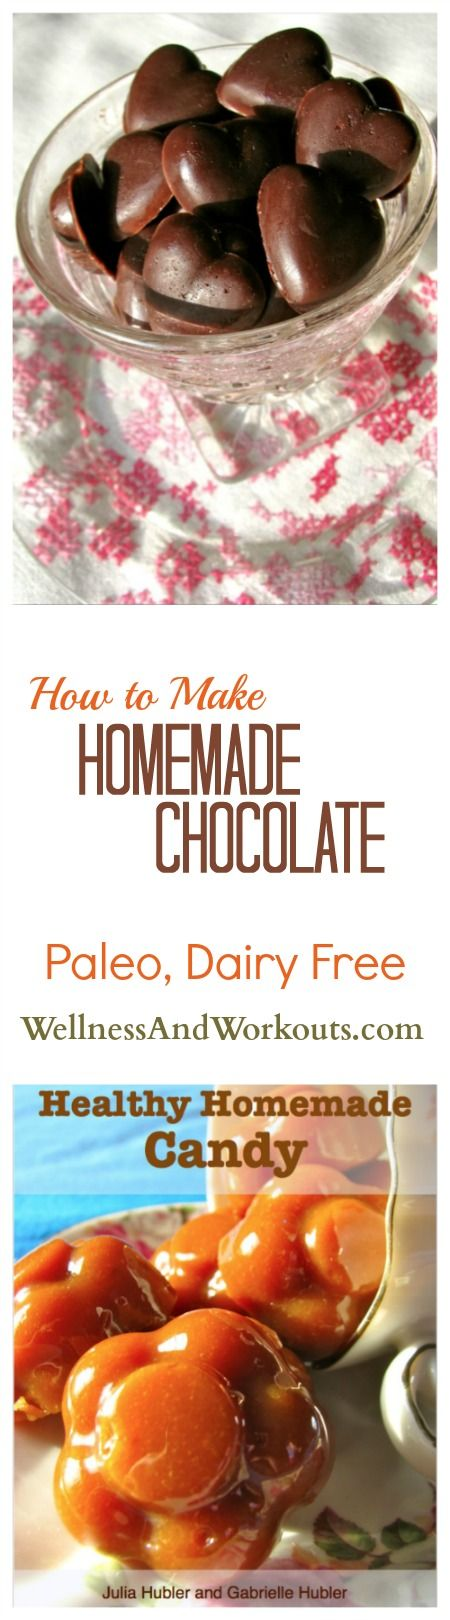 How to Make Homemade Chocolate | Paleo, Fair Trade Cocoa, Gluten Free